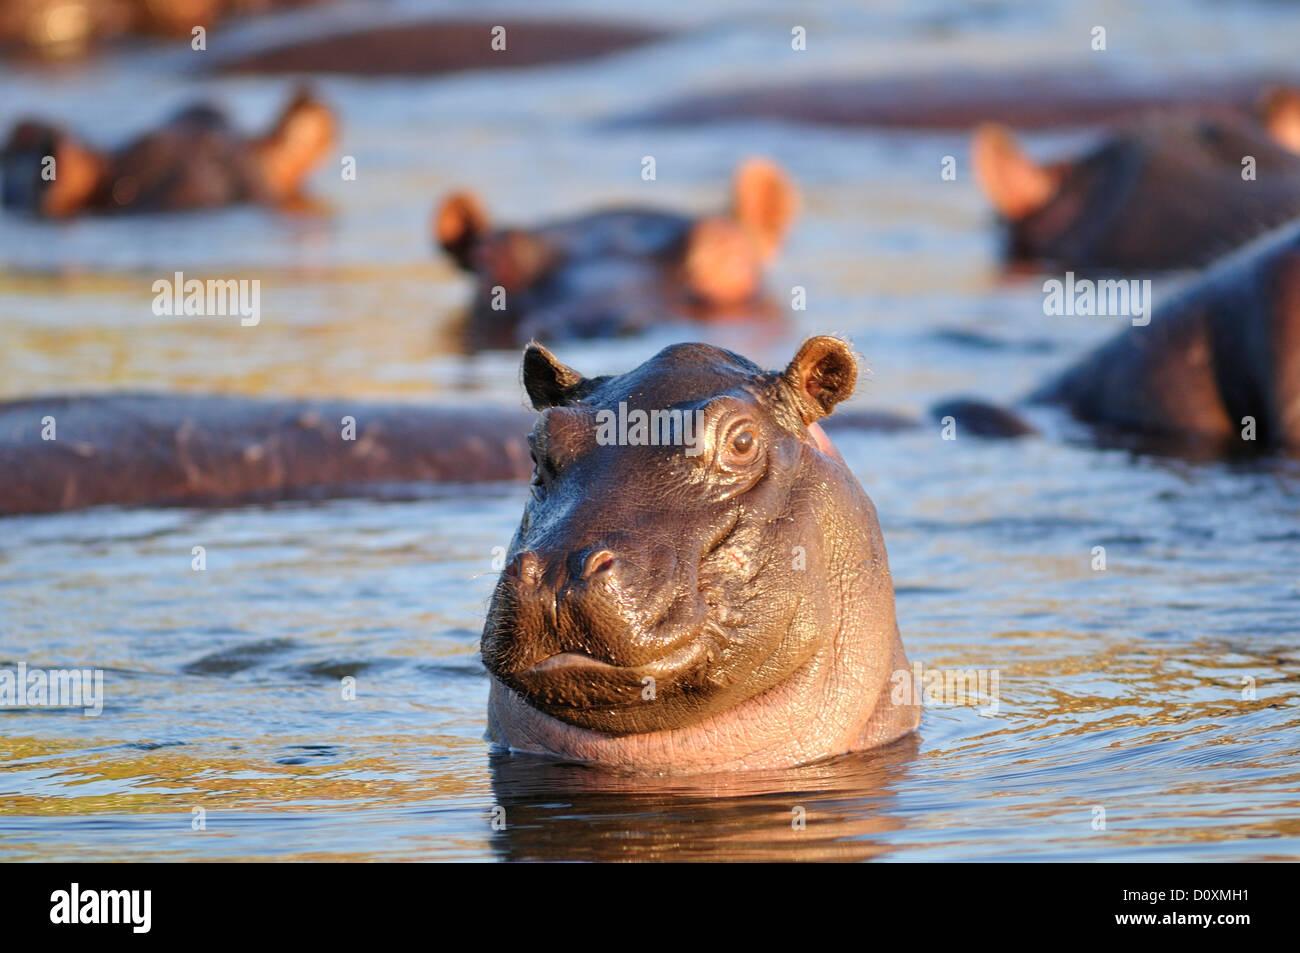 Africa, Botswana, Chobe, National Park, Hippopotamus amphibius, Hippo, Hippopotamus, animal, river, wildlife, wild, - Stock Image